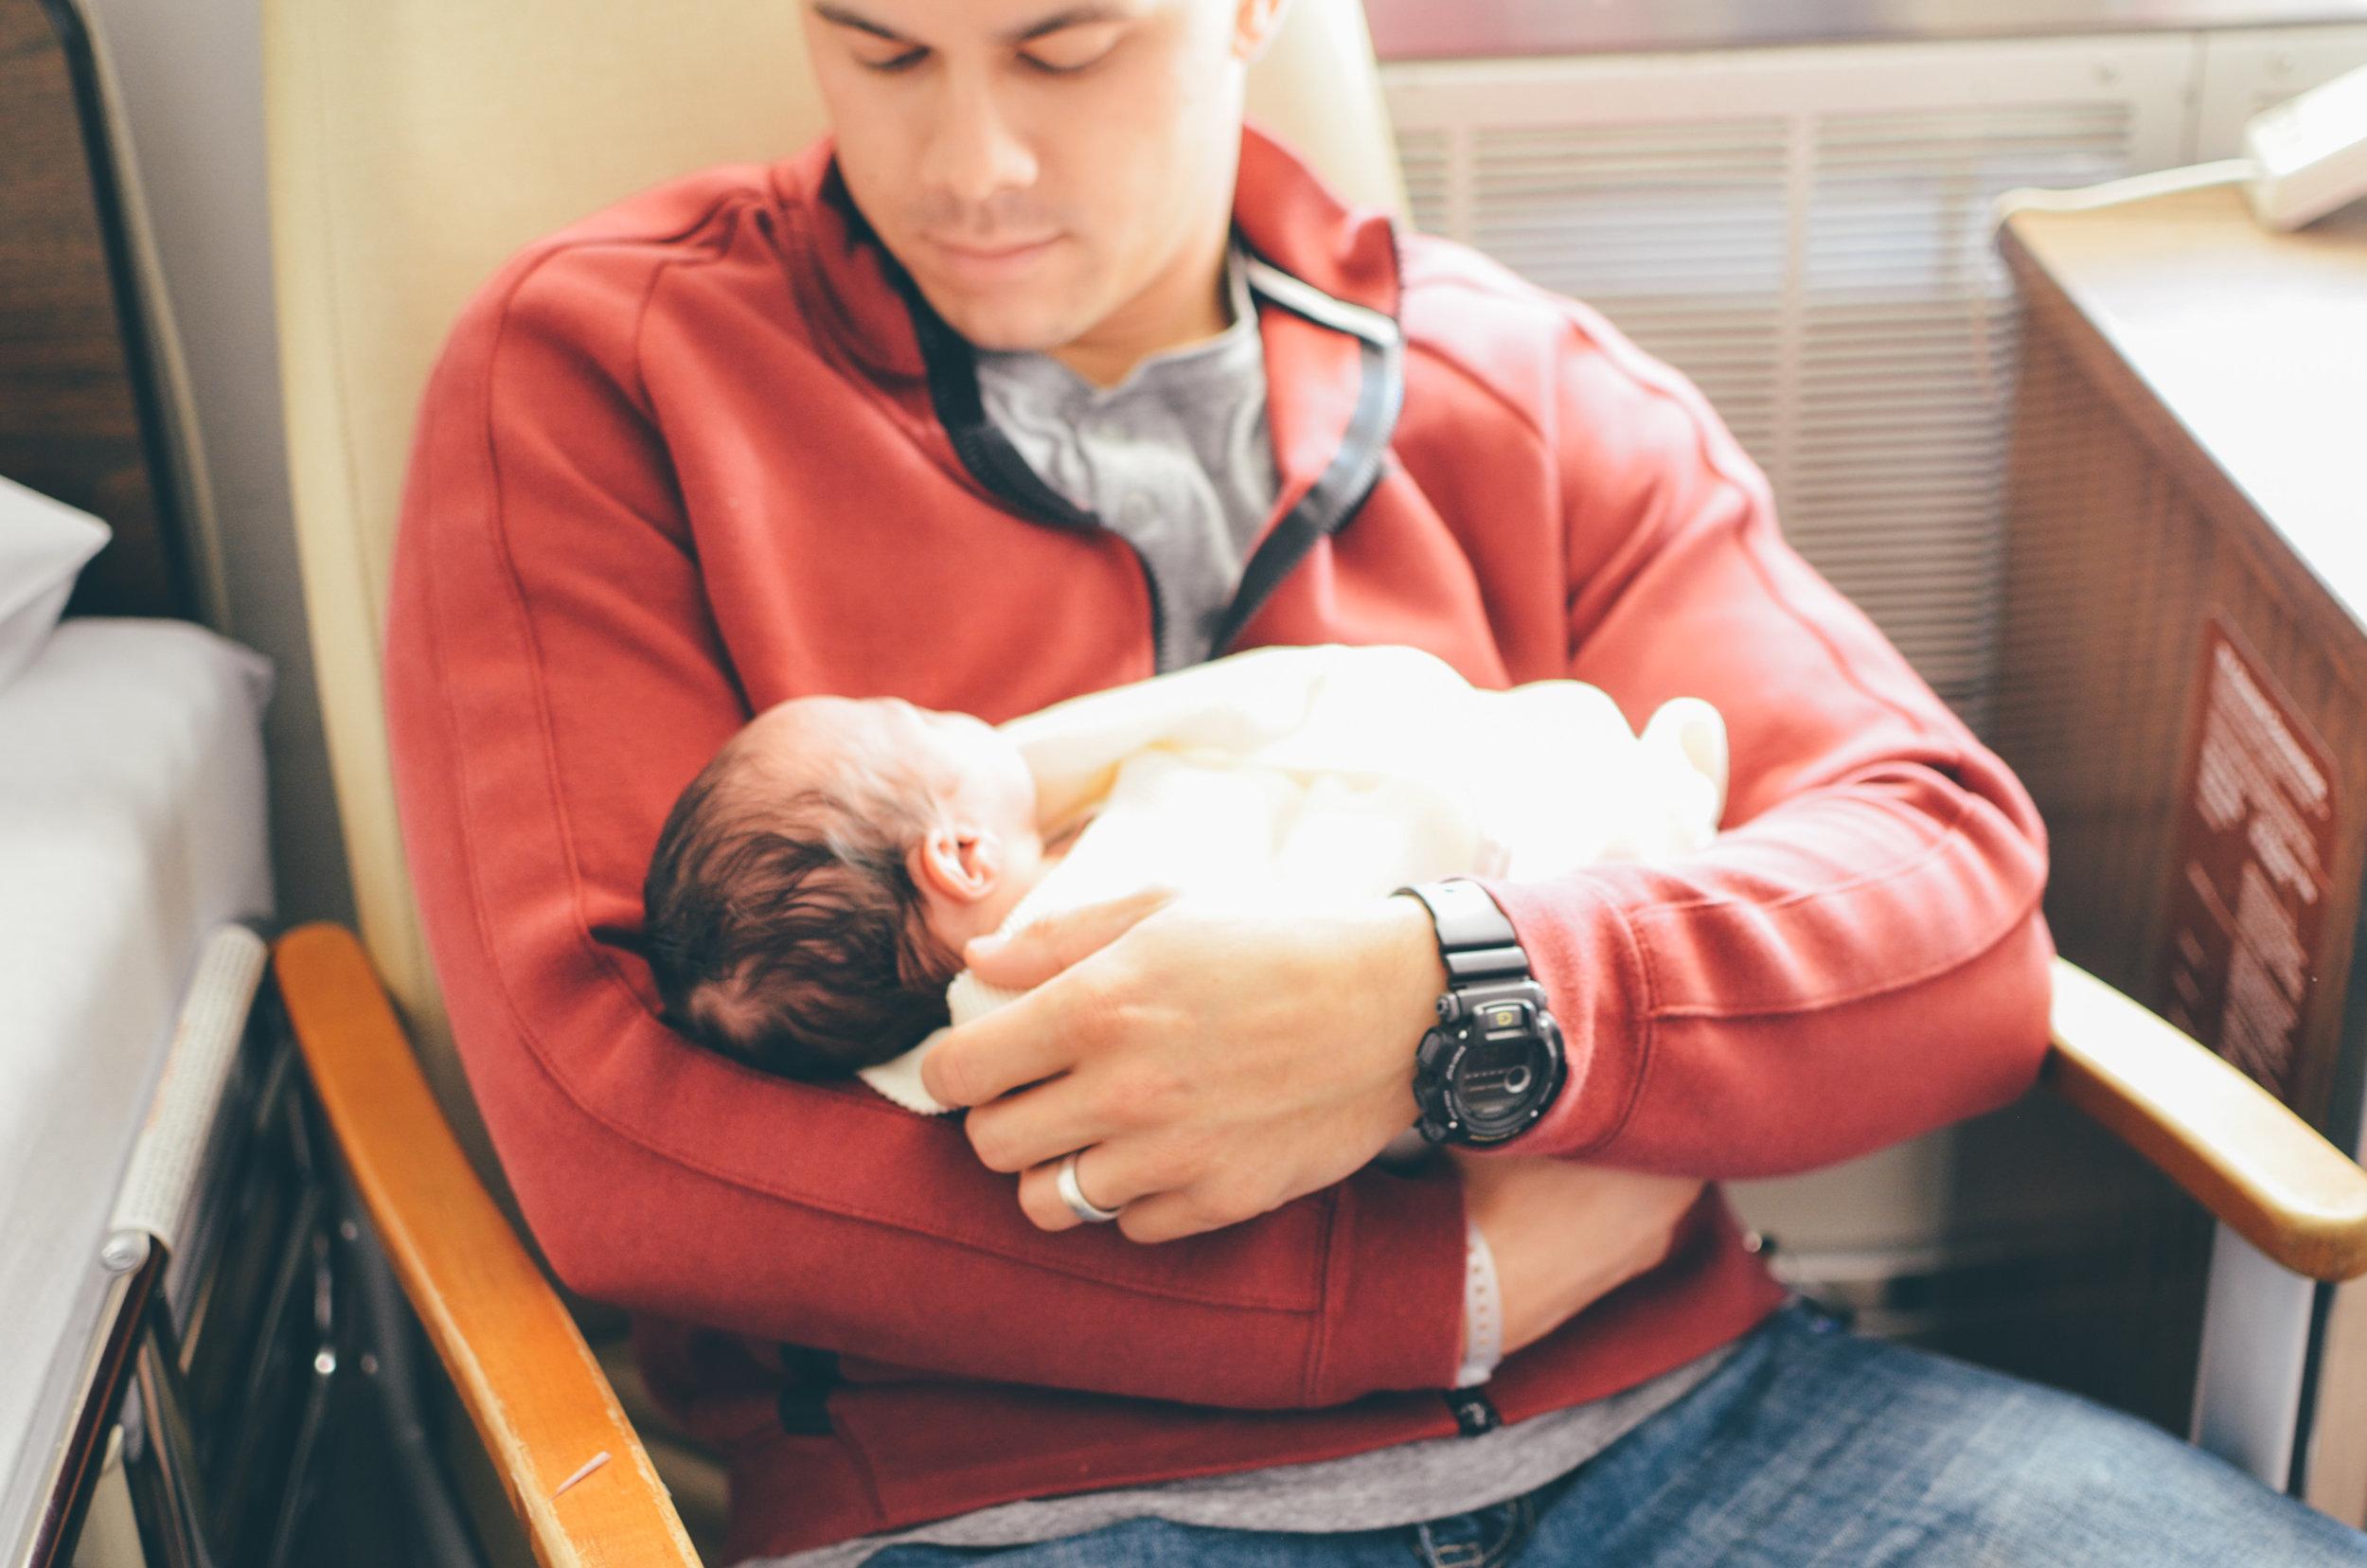 Syracuse, NY Fresh 48 Newborn Hospital Photography